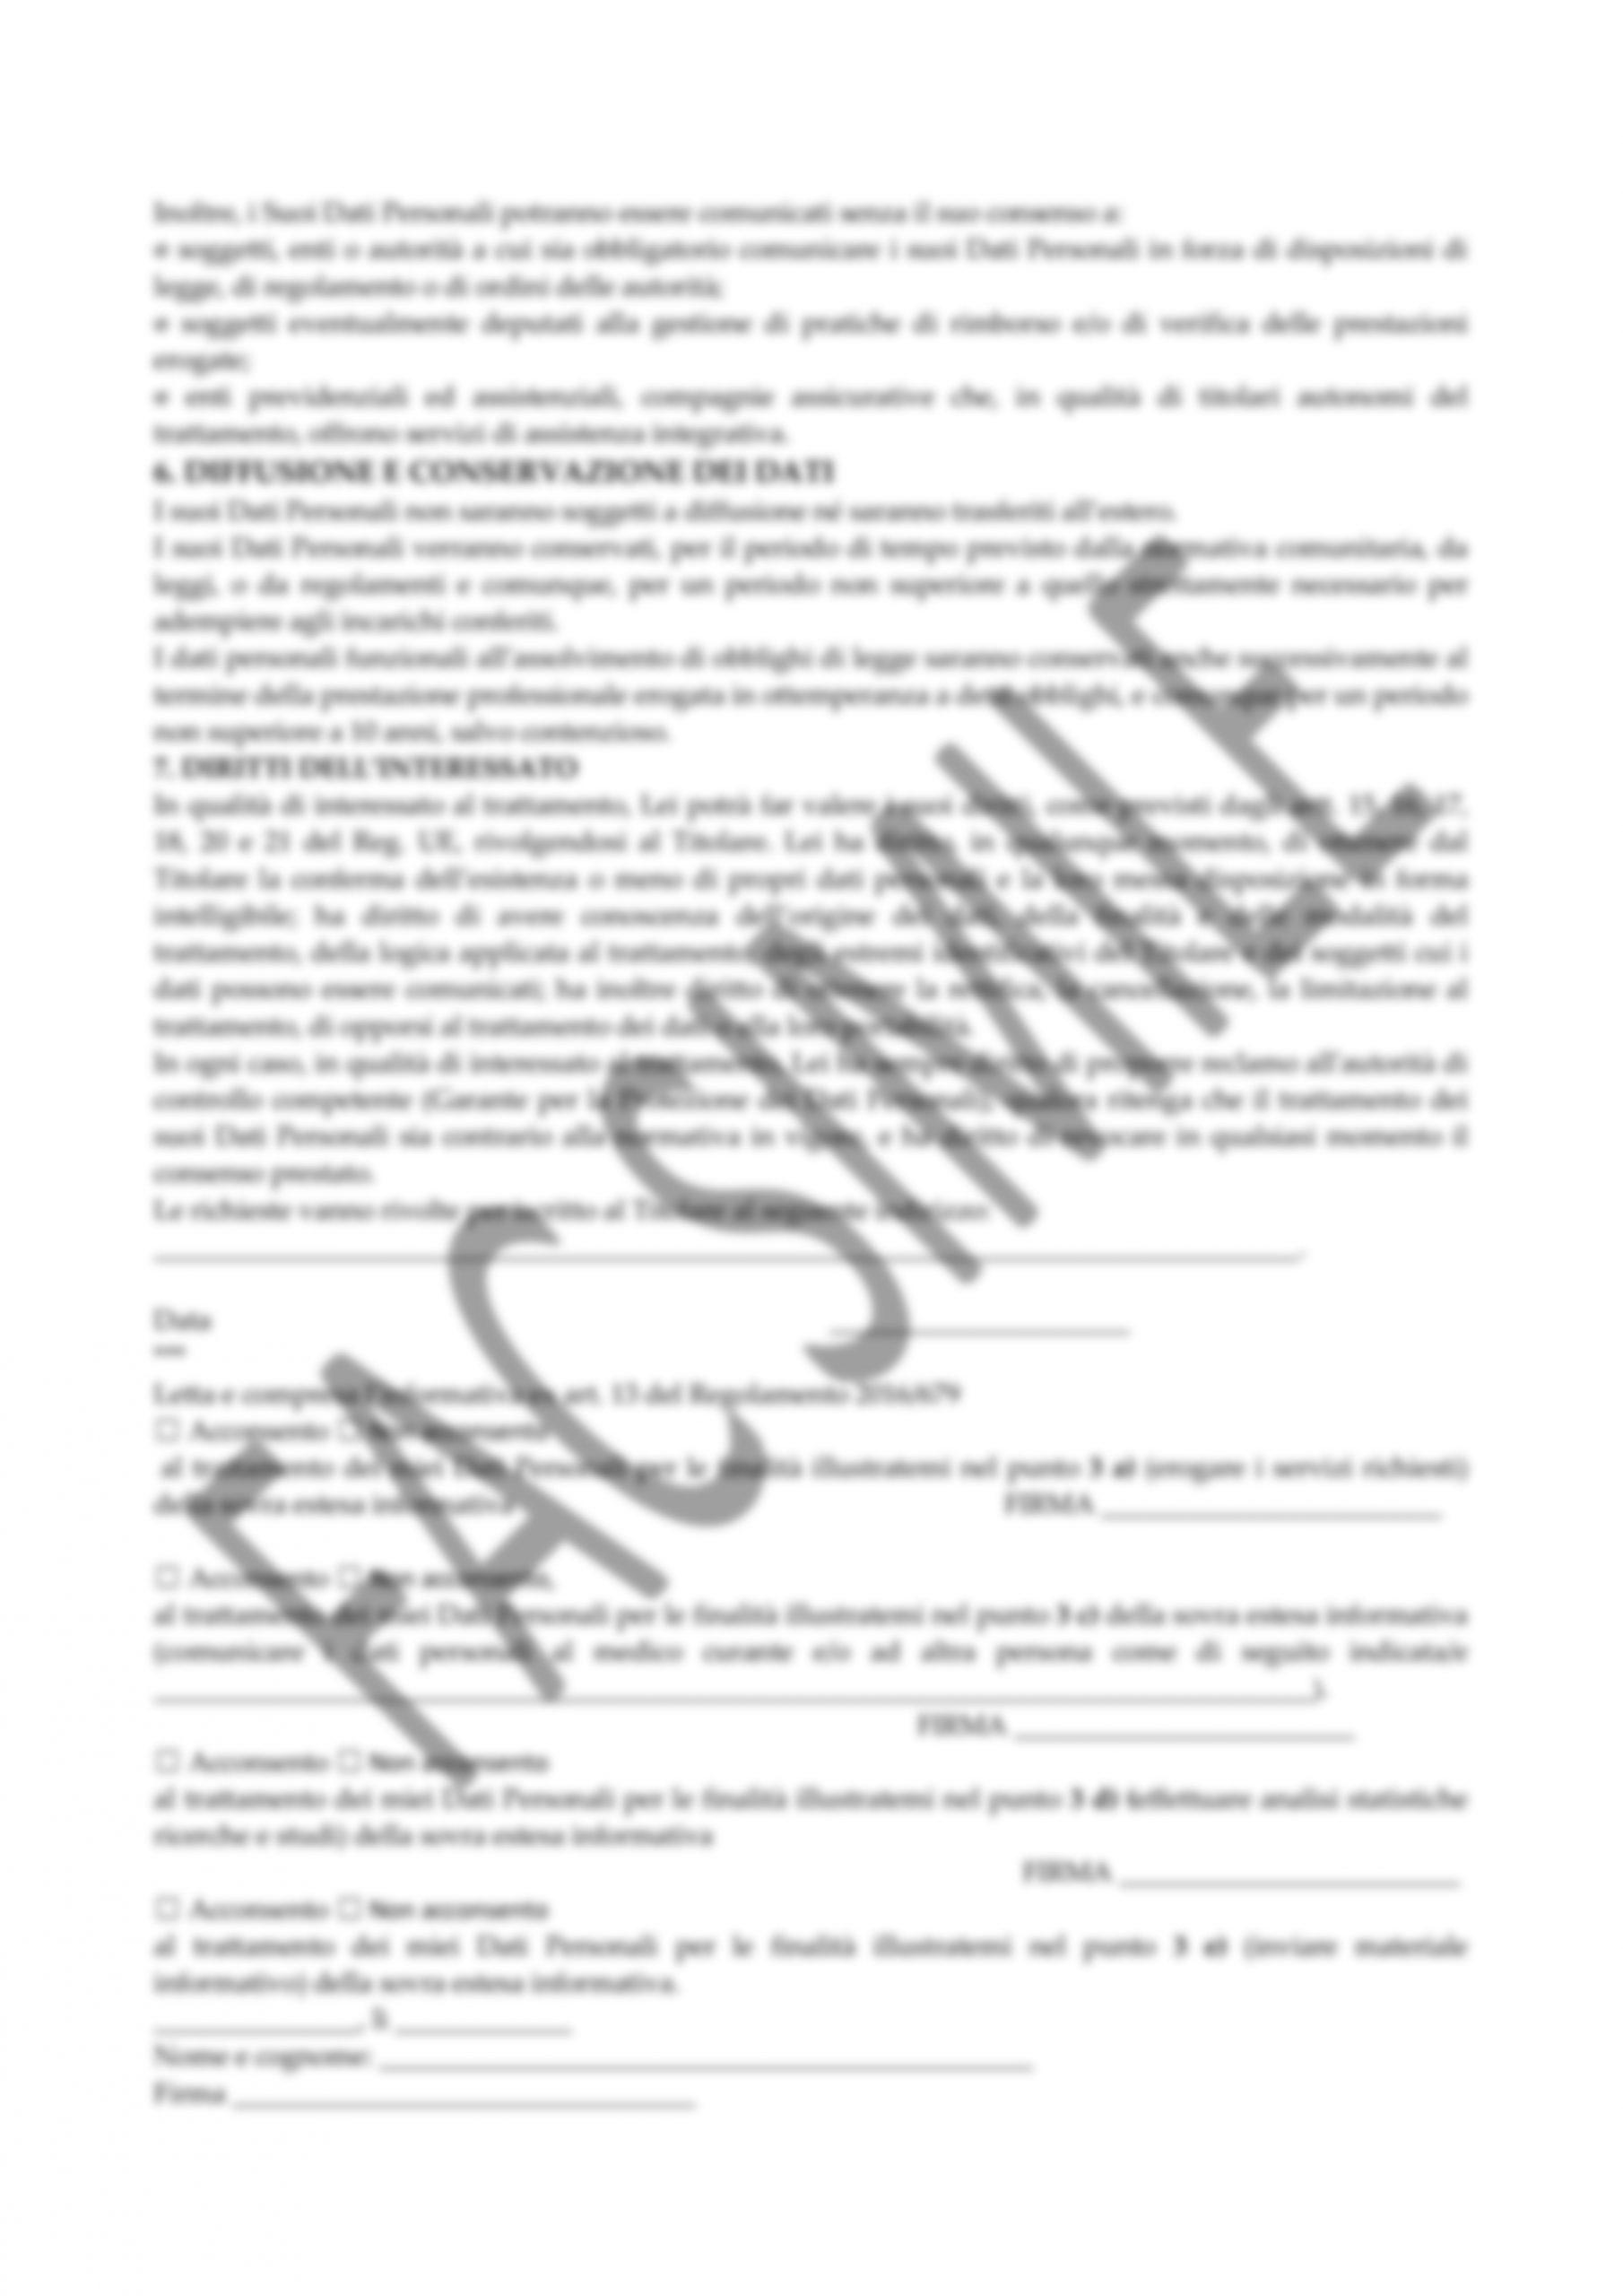 Microsoft Word - FACSIMILE INFORMATIVA.doc